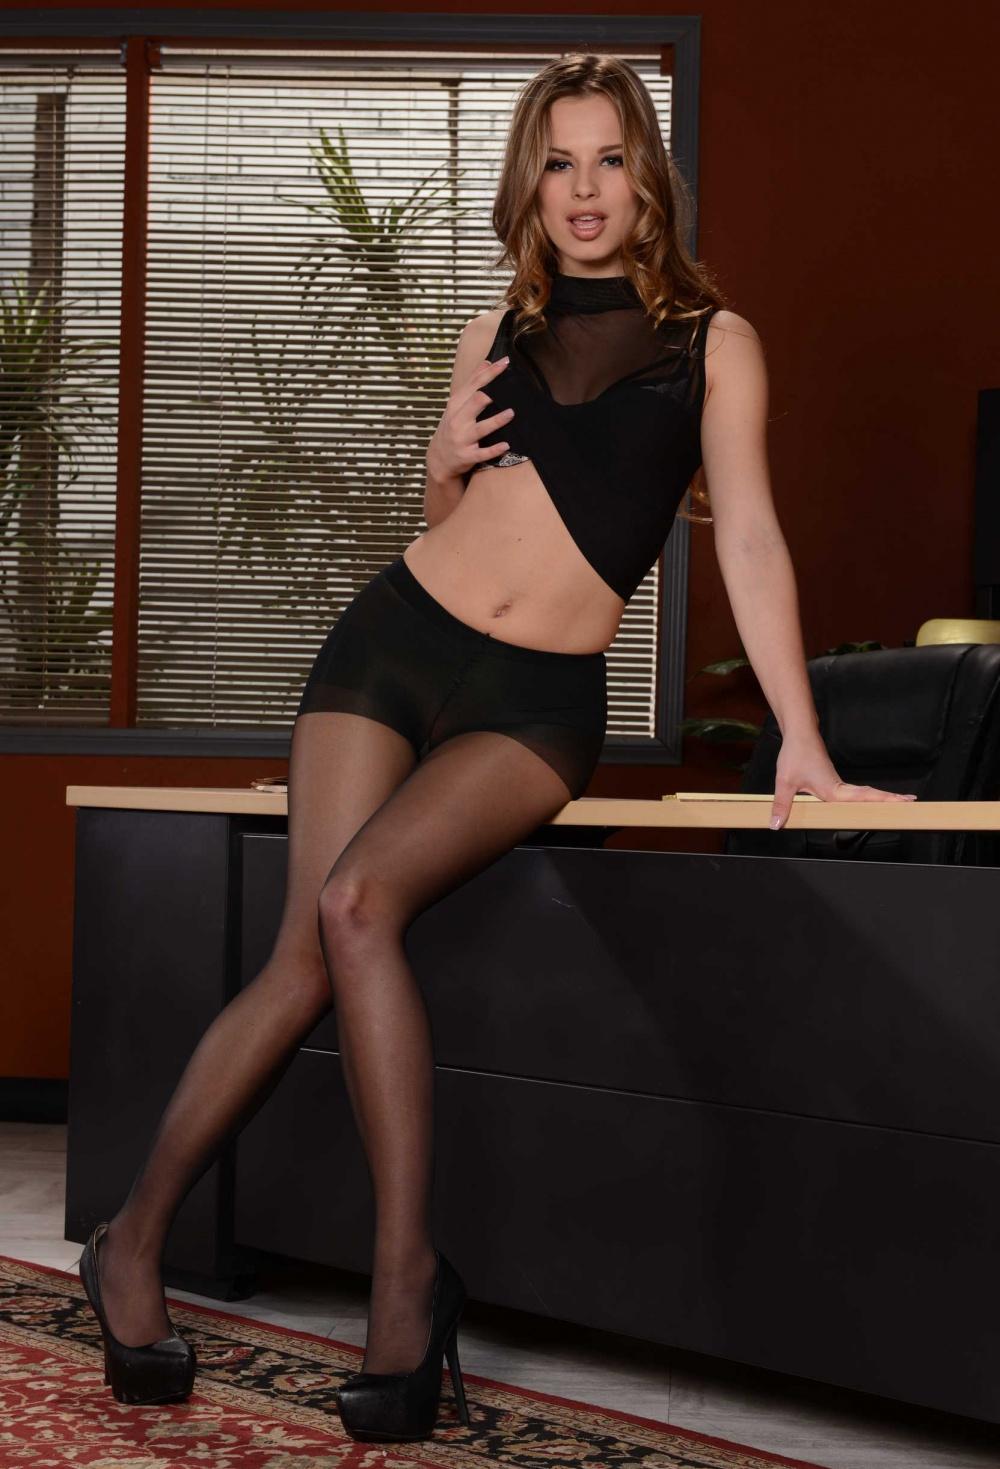 Luscious pornstar in black stockings Jillian Janson goes interracial hardcore № 165624 без смс